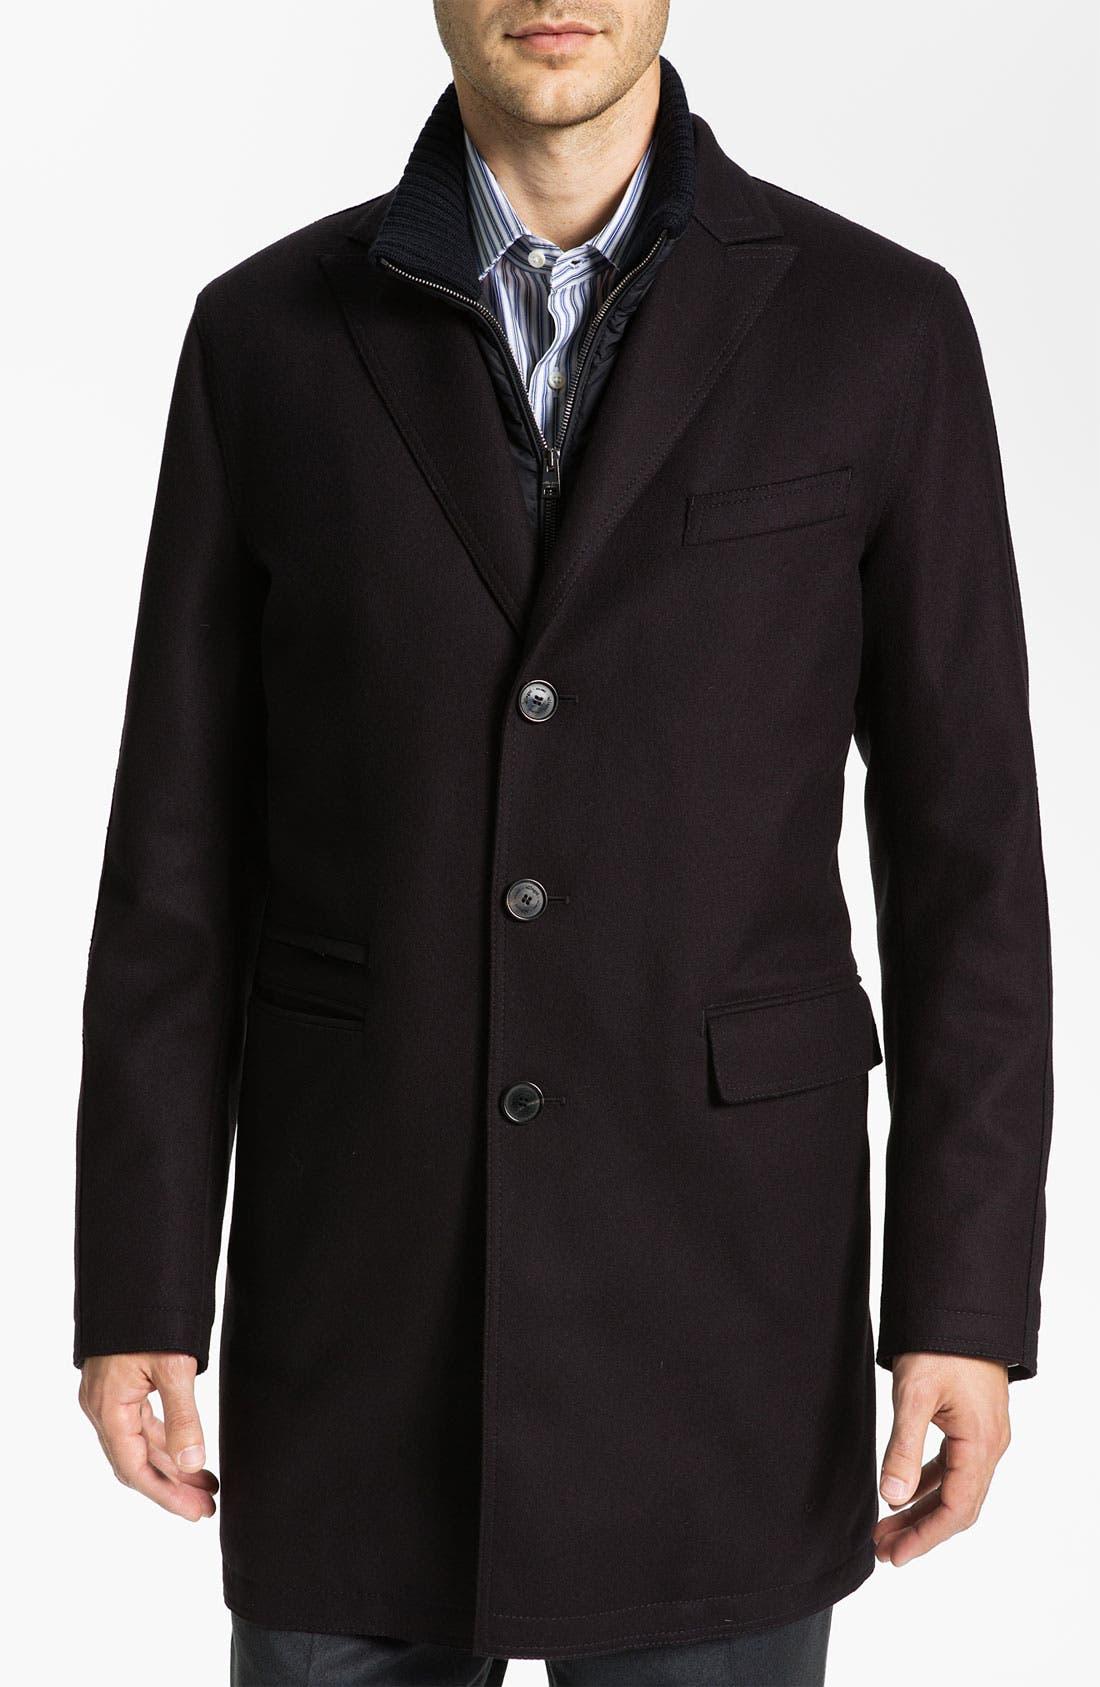 Alternate Image 1 Selected - Allegri 'Techno' Water Resistant Top Coat